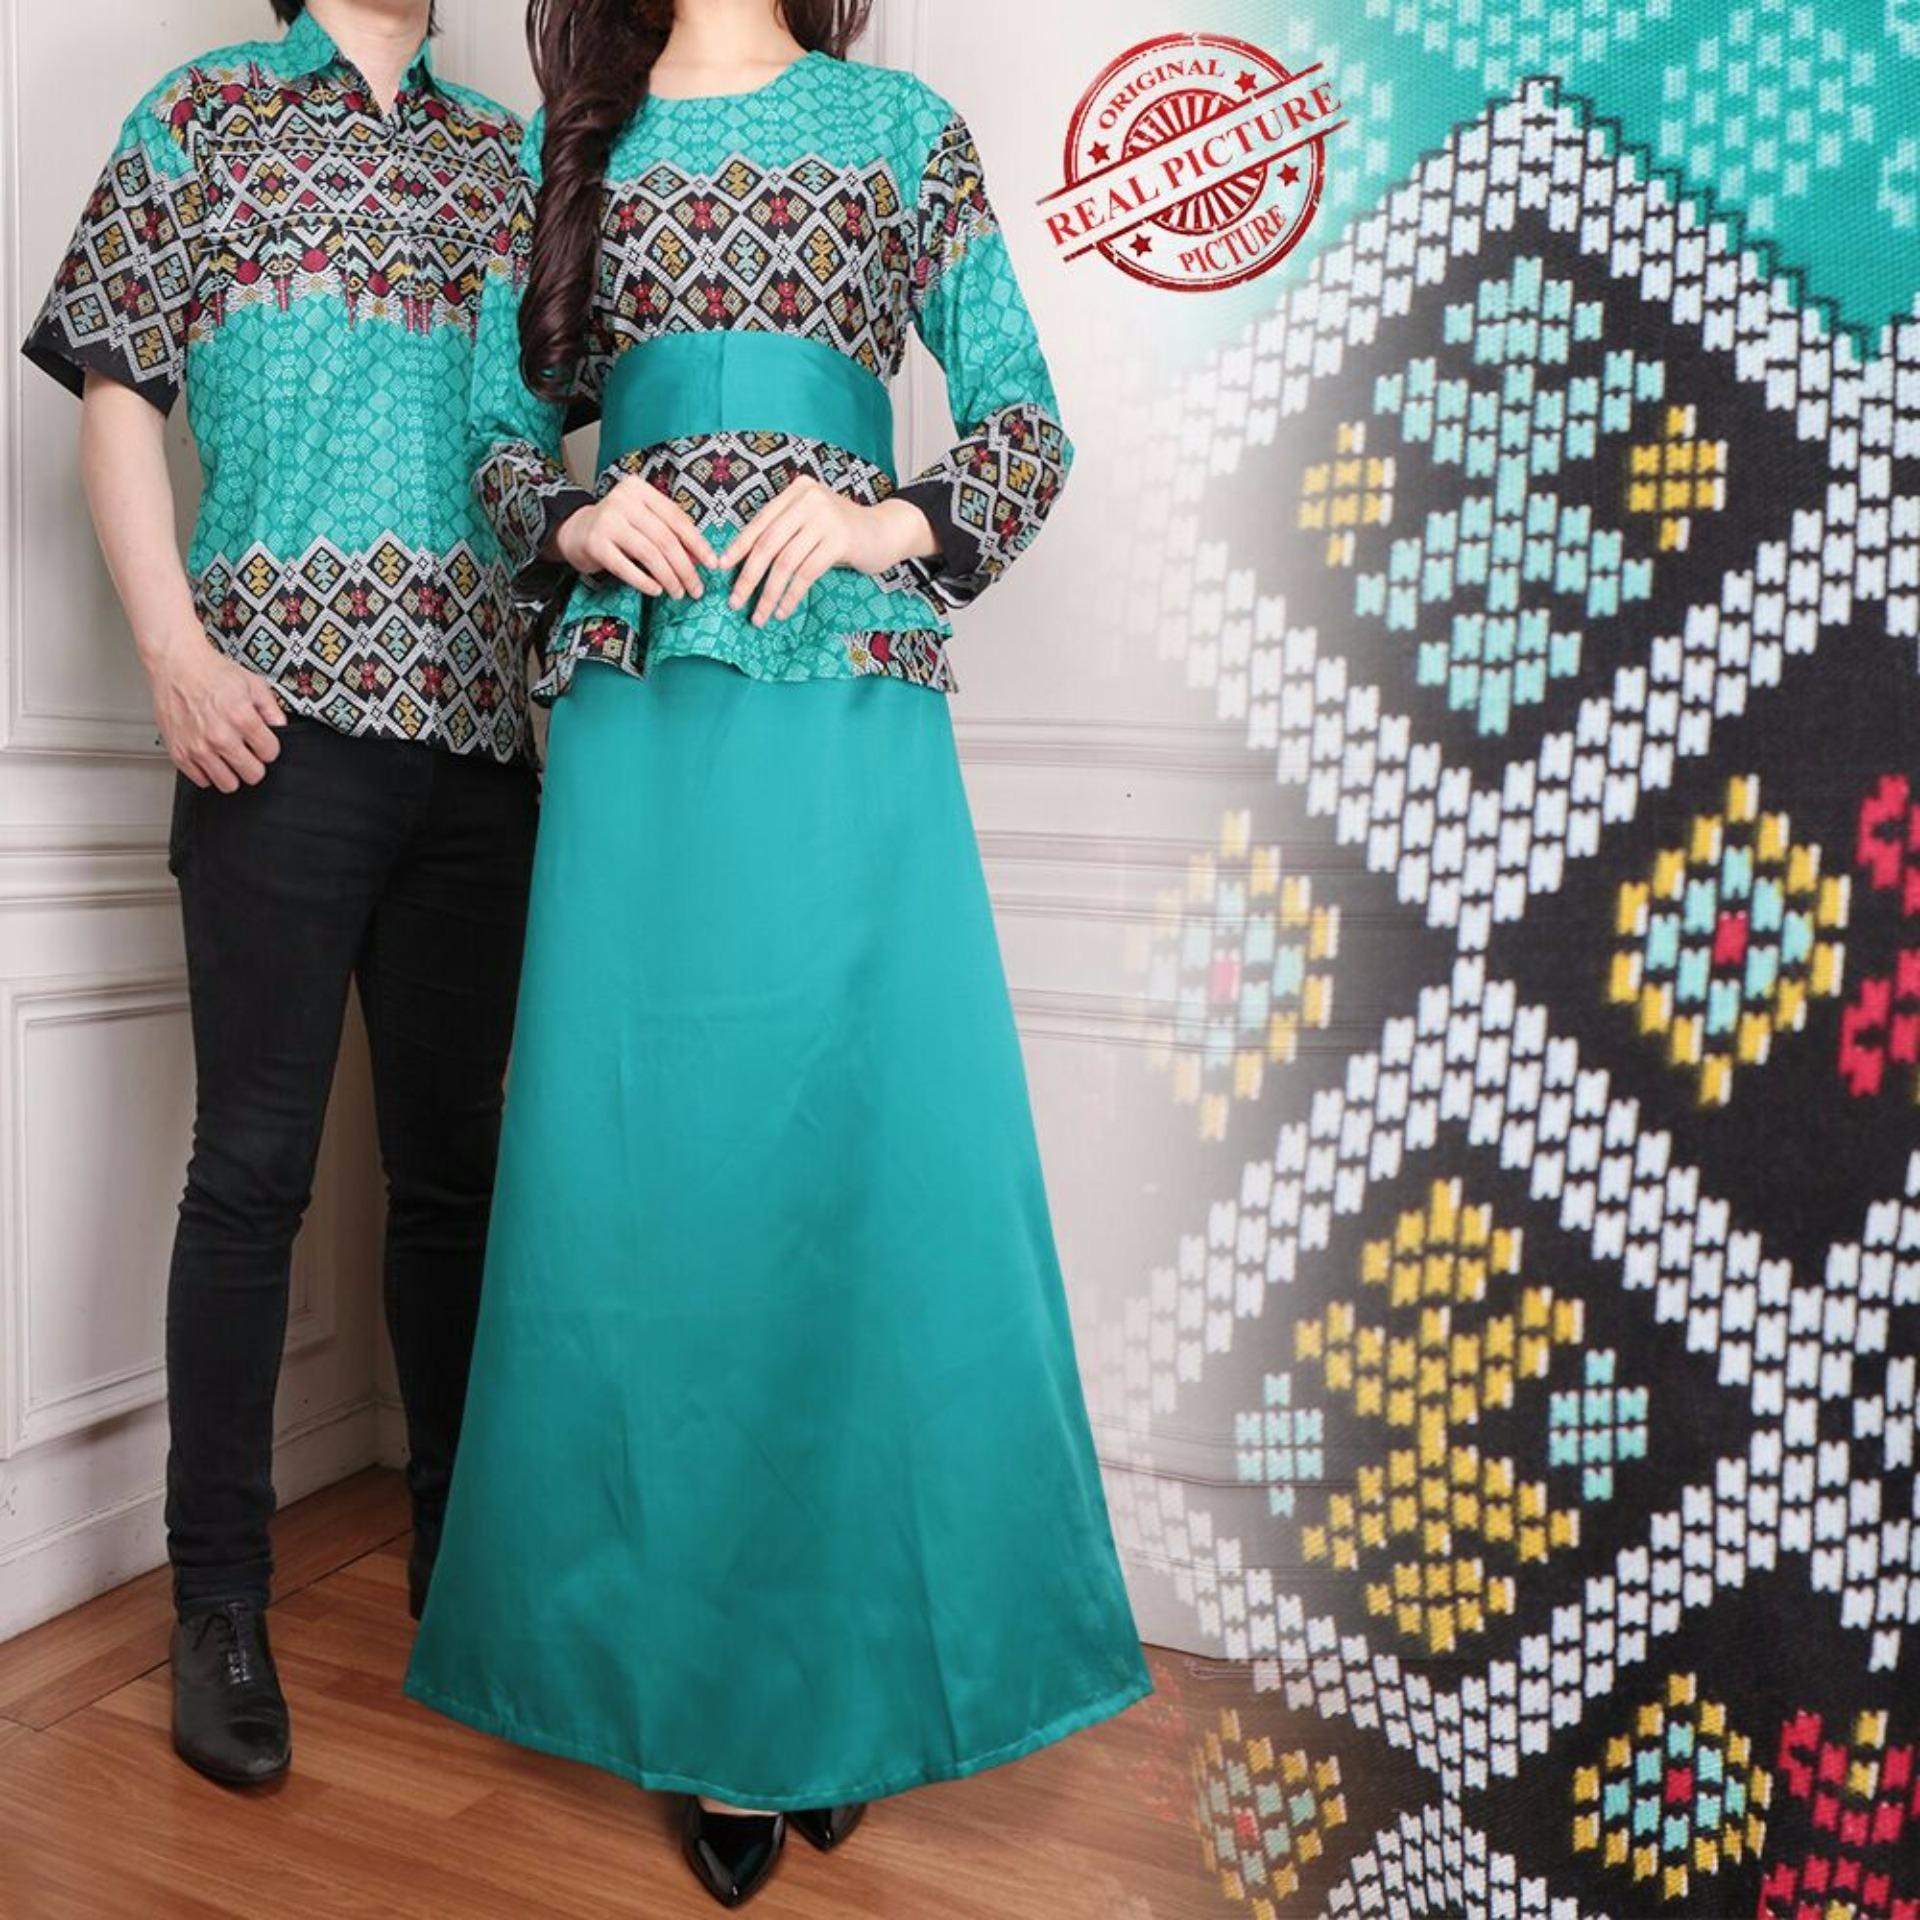 f08a4cda12 SALE STOCK SB Collection Couple Gamis Jumbo Longdress dan Kemeja ...